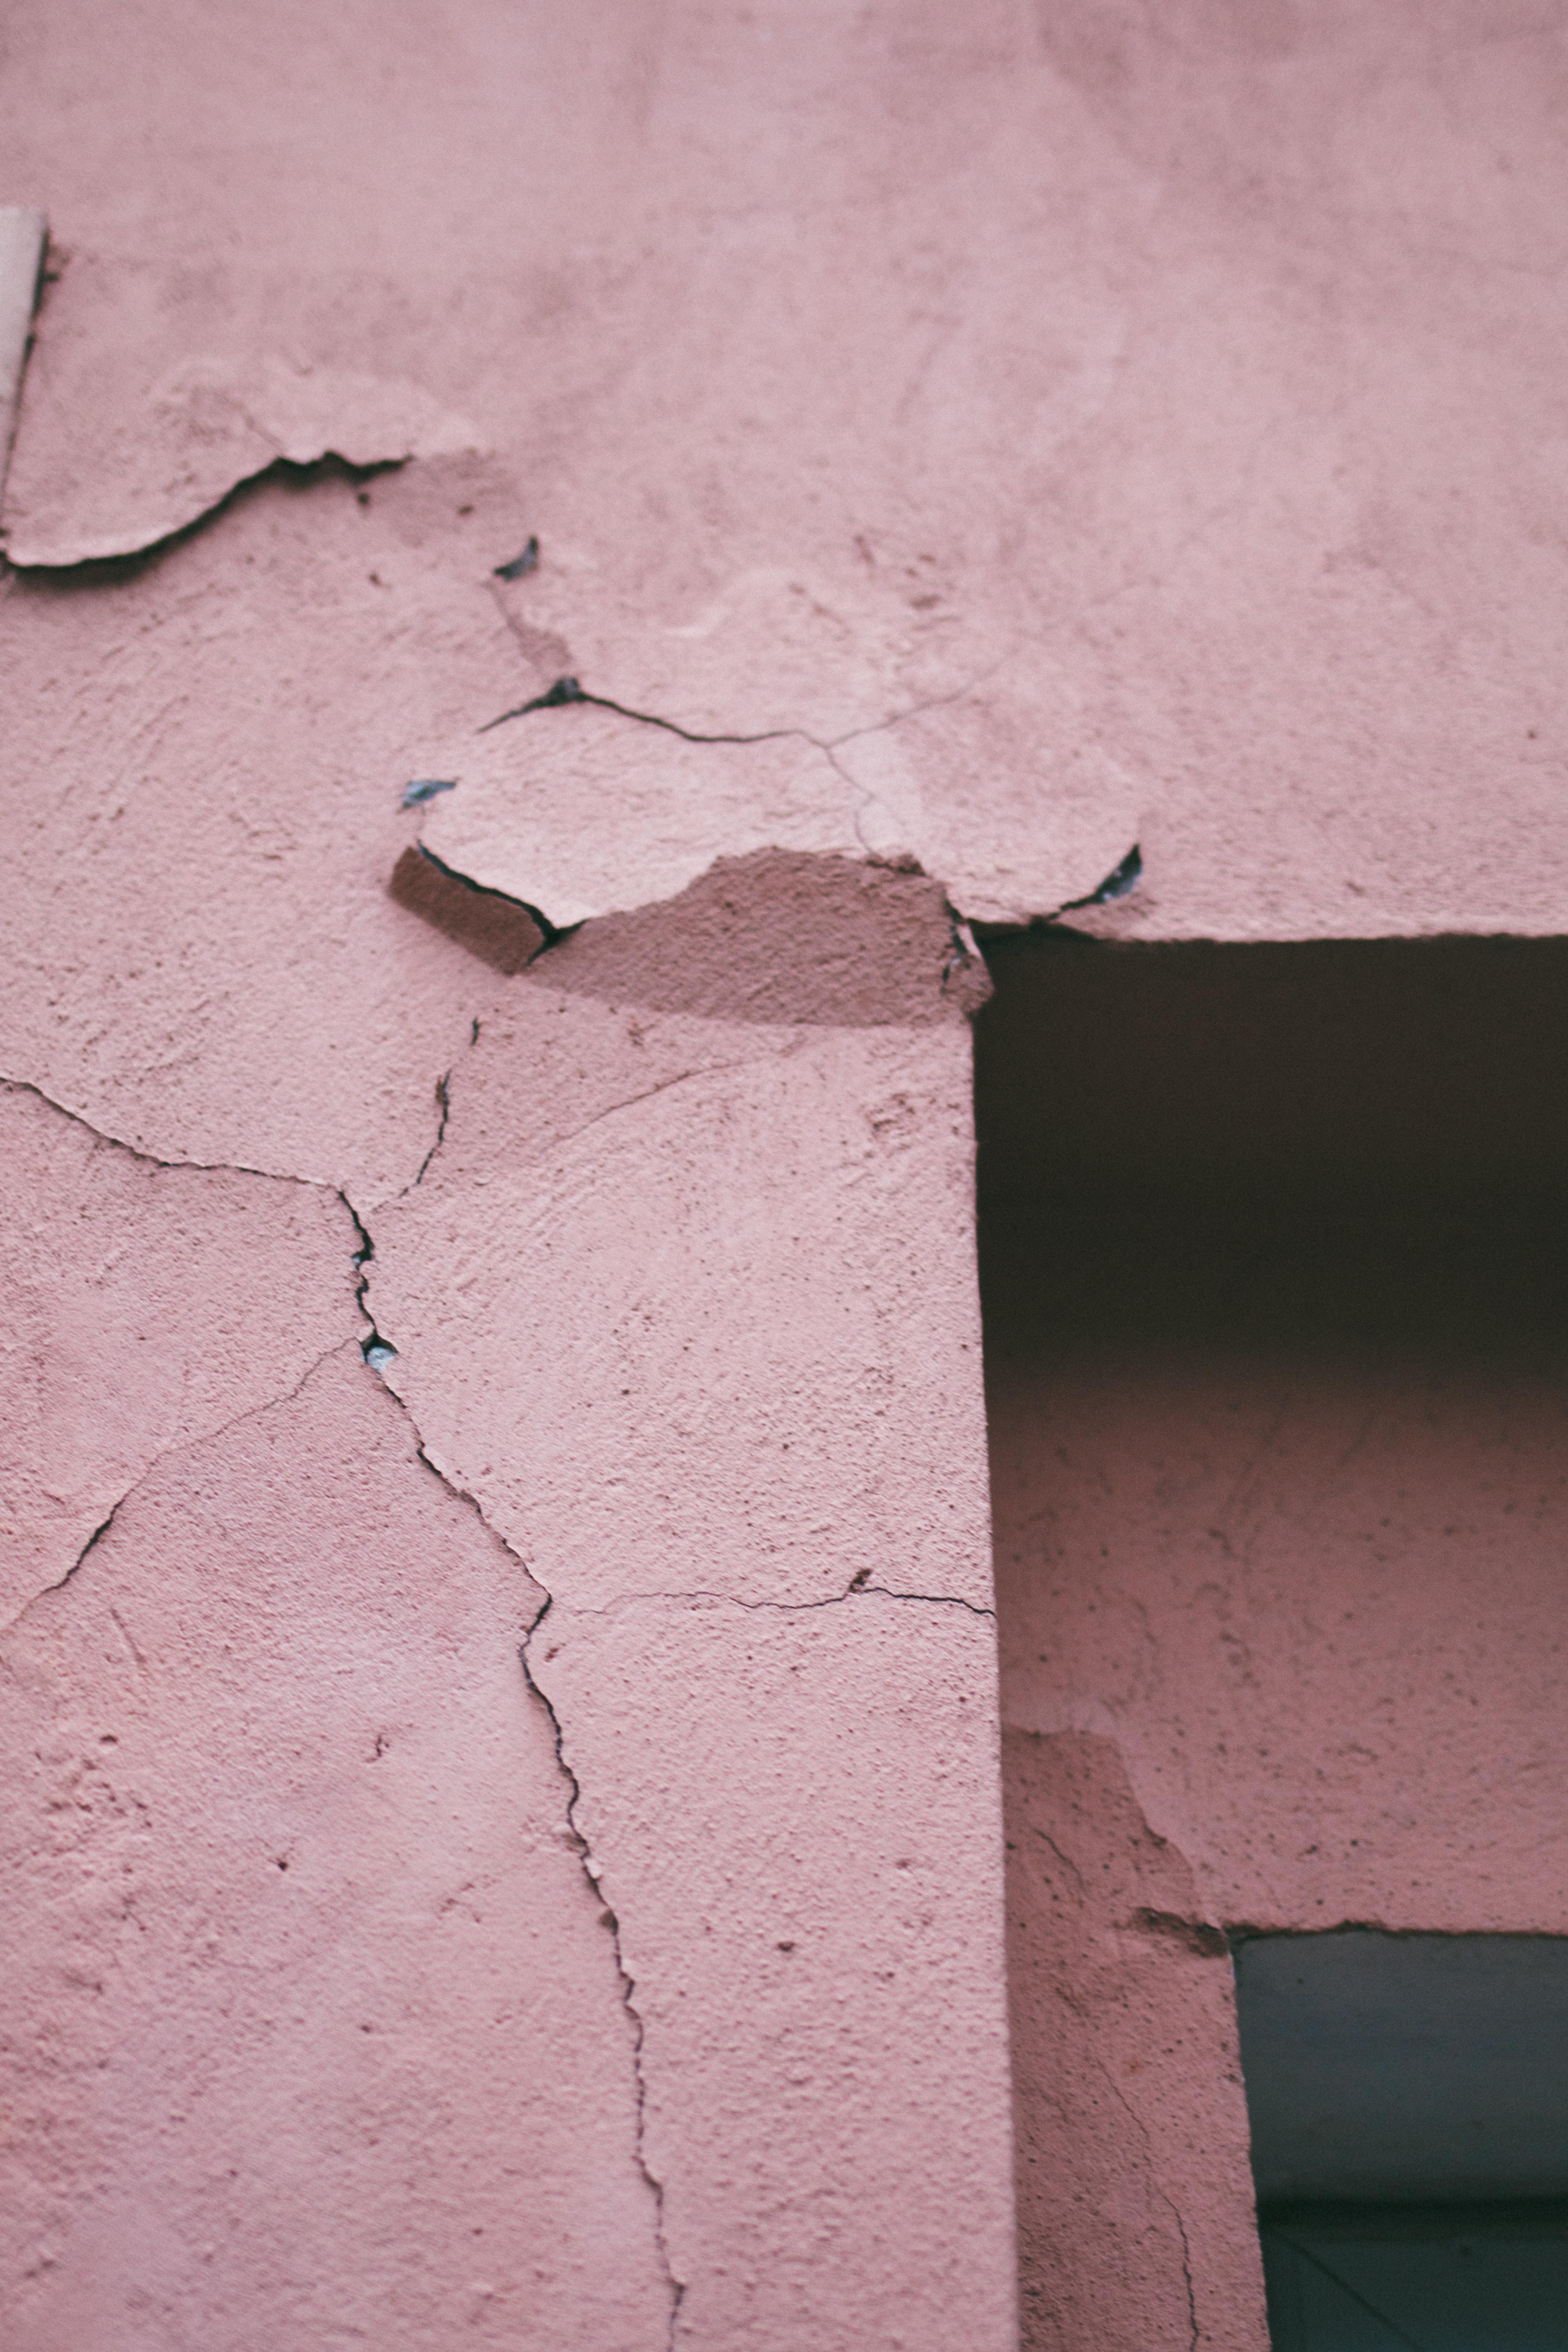 old-rose-color-of-concrete-wall-cracks.jpg